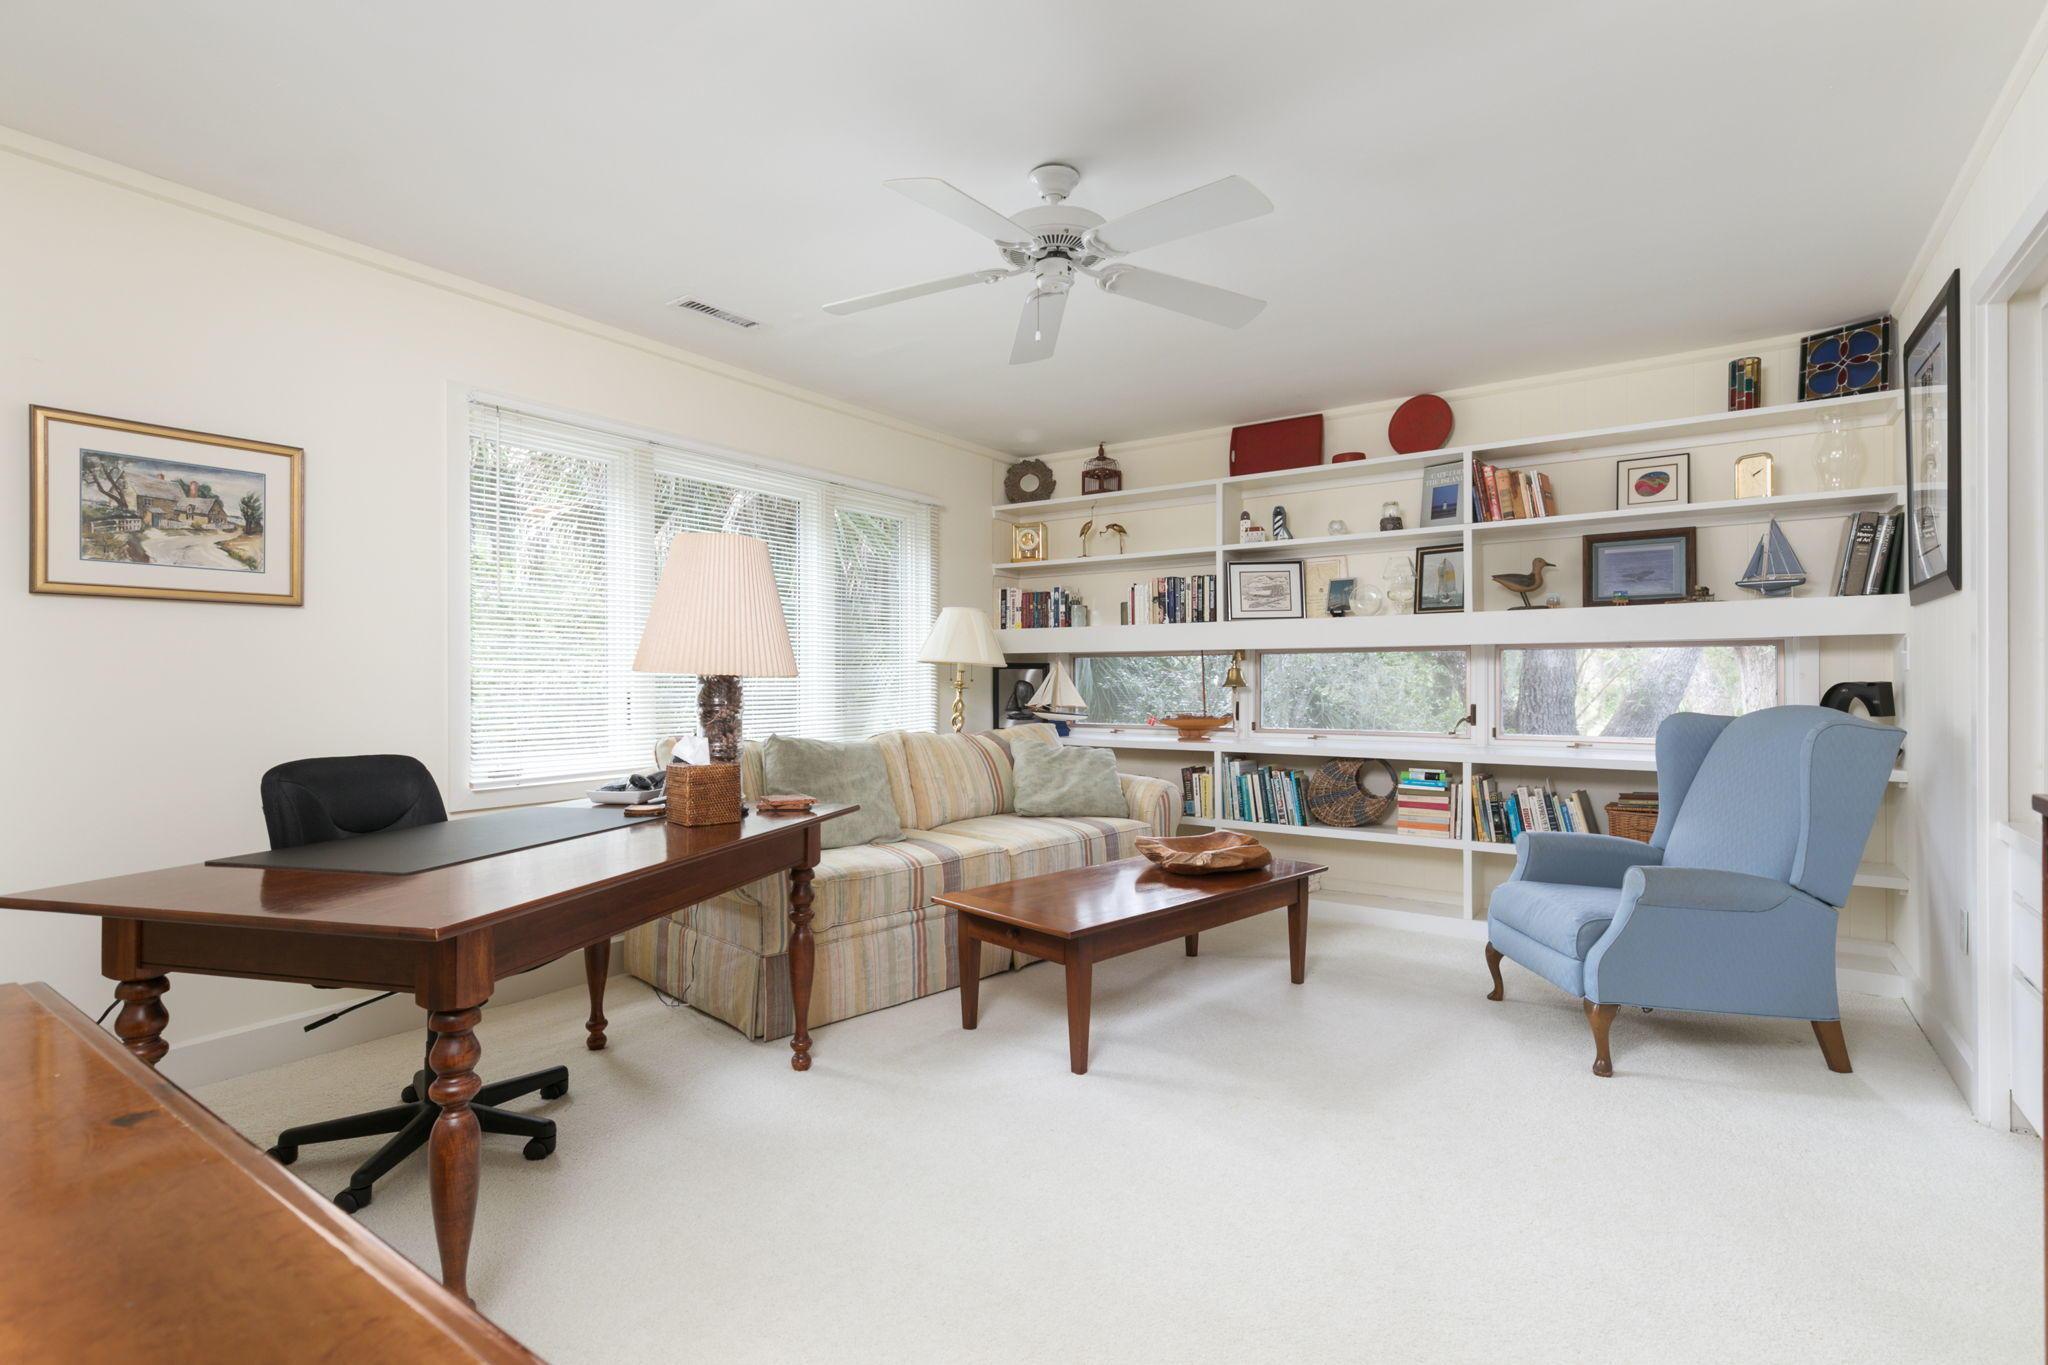 Seabrook Island Homes For Sale - 3360 Seabrook Island, Seabrook Island, SC - 5